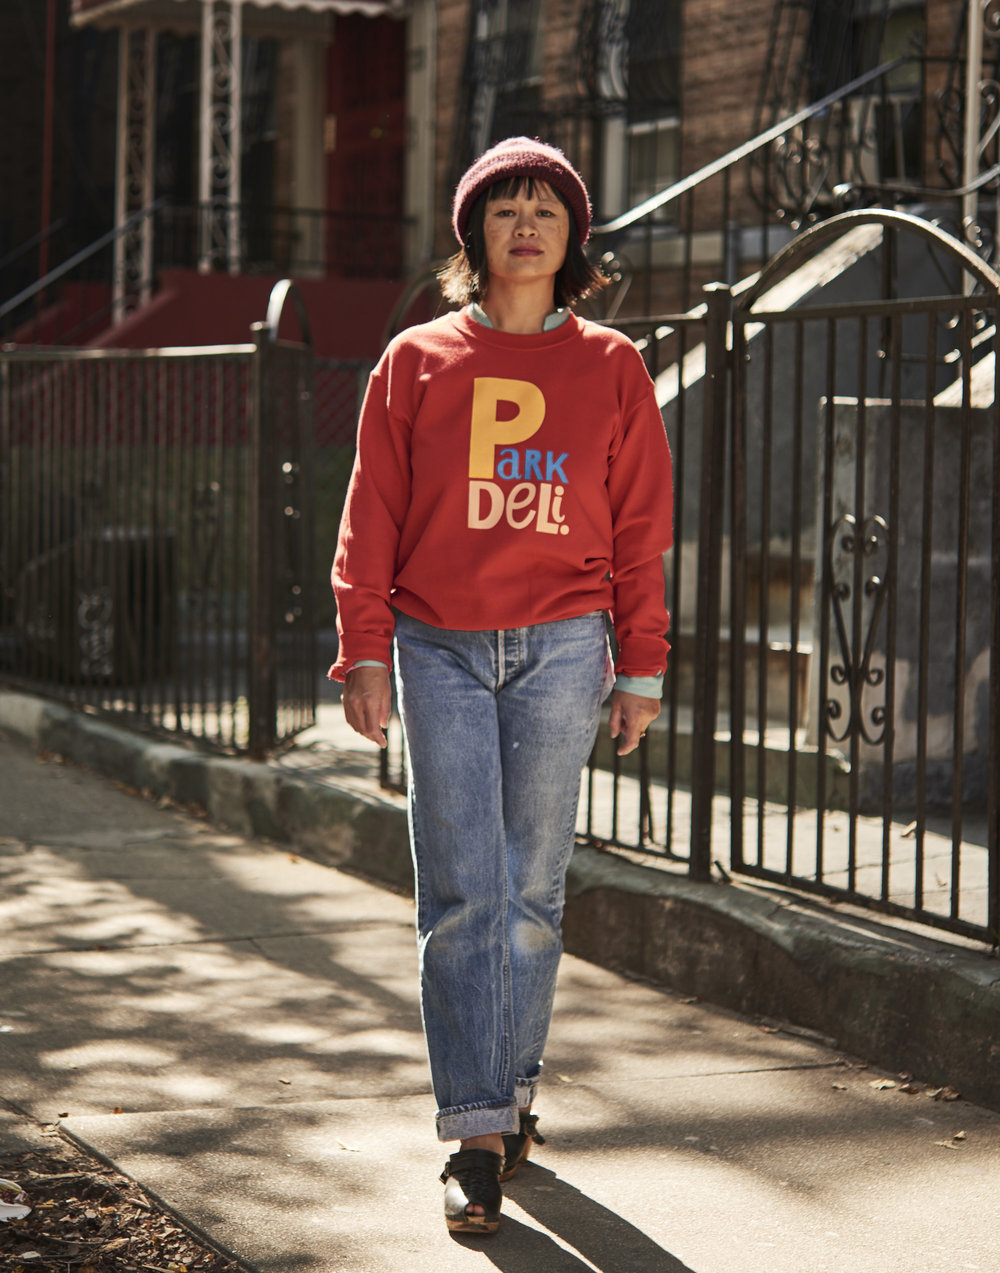 Park Deli Crew Neck Sweatshirt